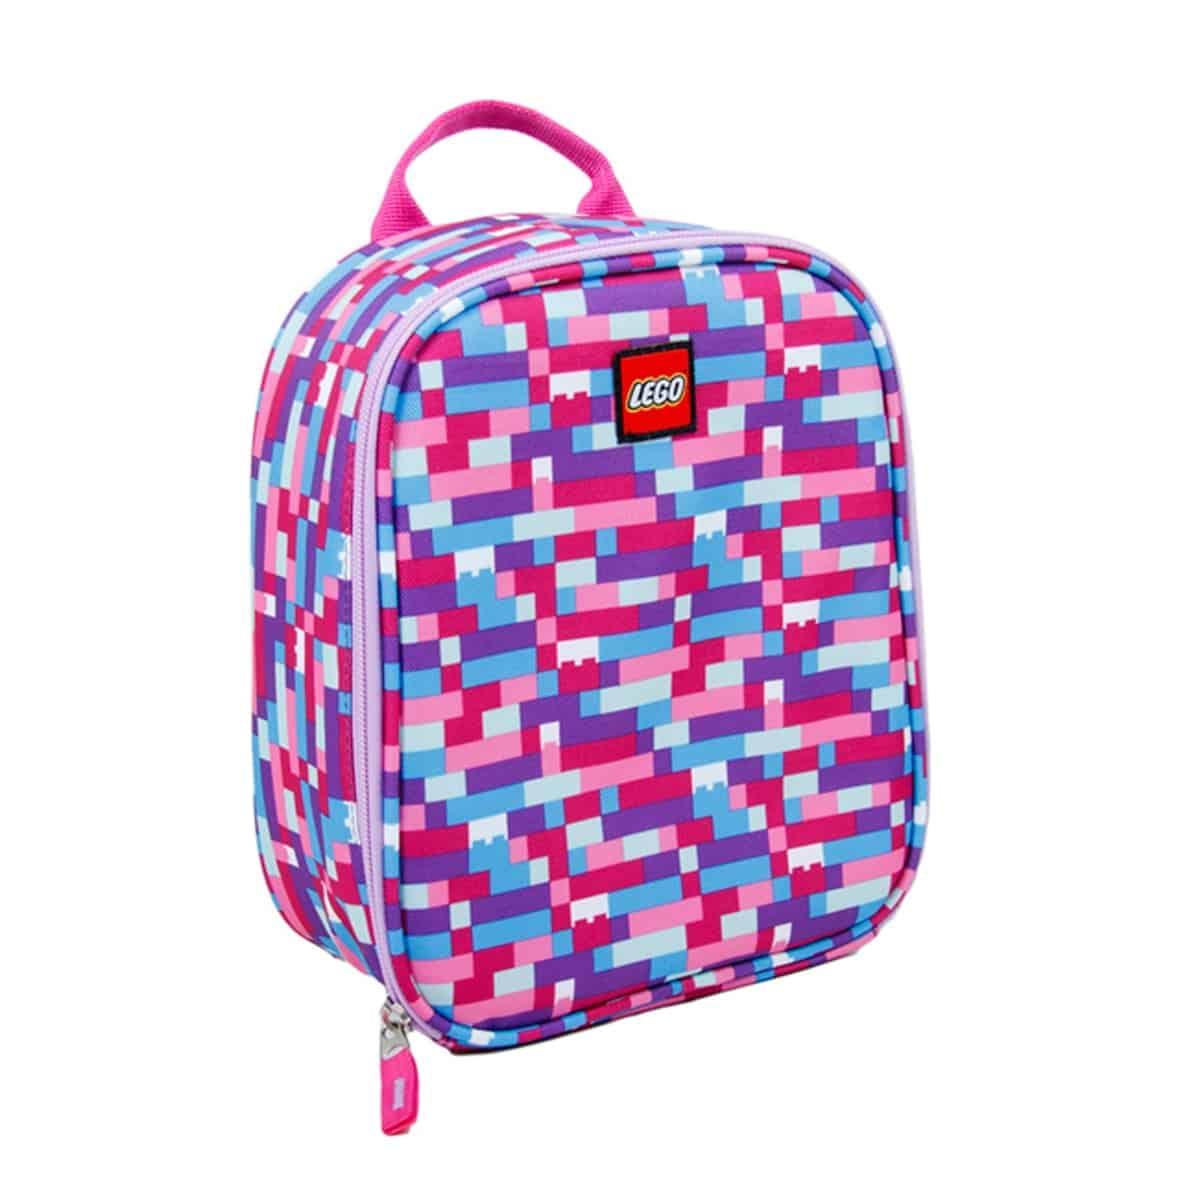 lego 5005354 pink purple brick print lunch bag